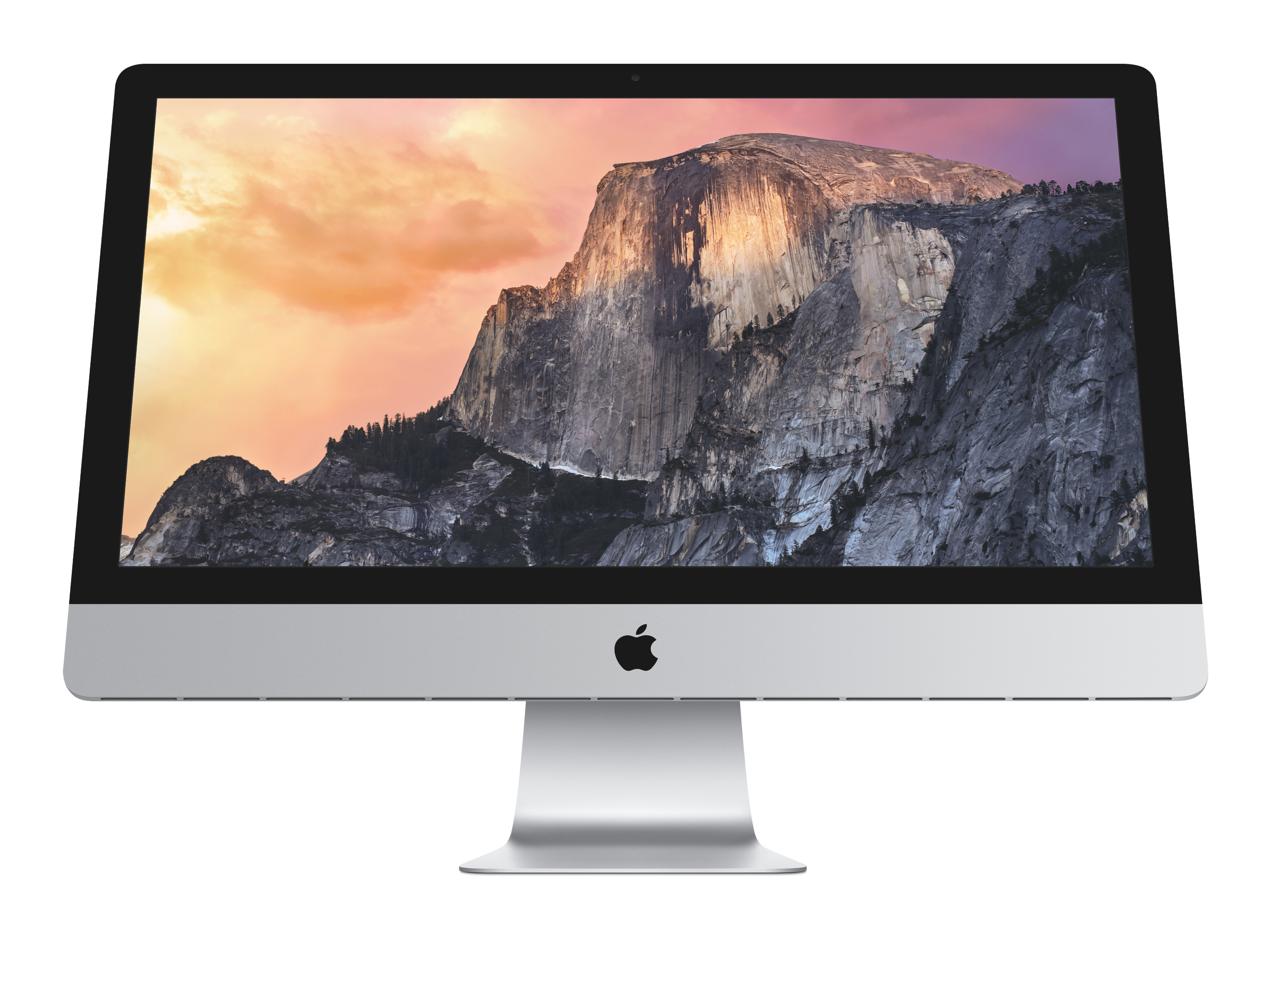 400 Franken günstiger – iMac mit Retina 5K Display.